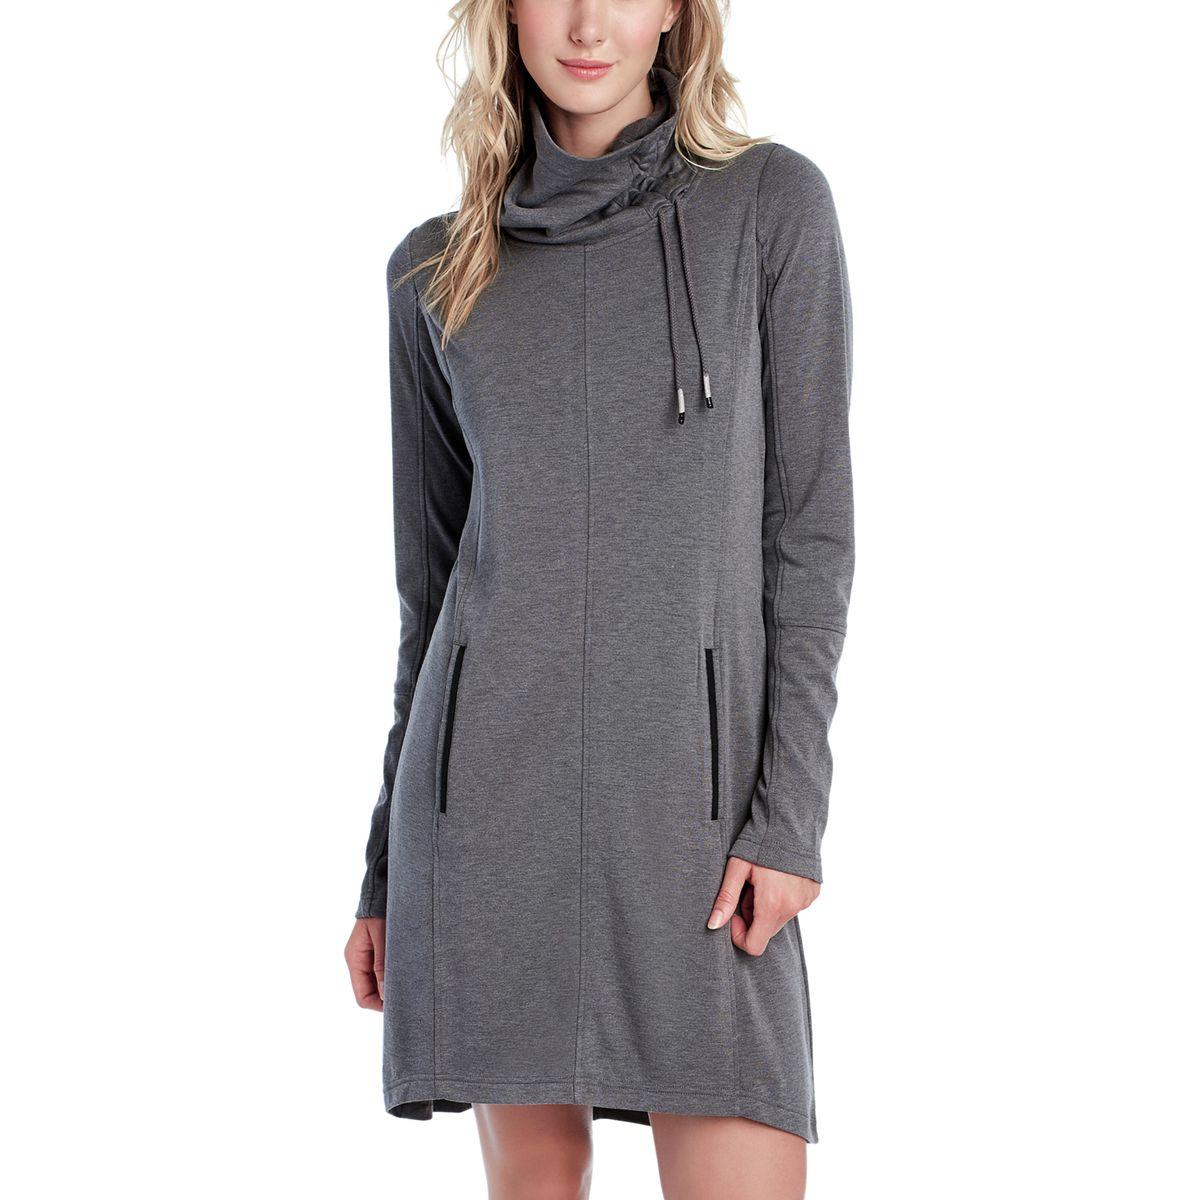 Lole Call Me Dress - Loleng-Sleeve - Women